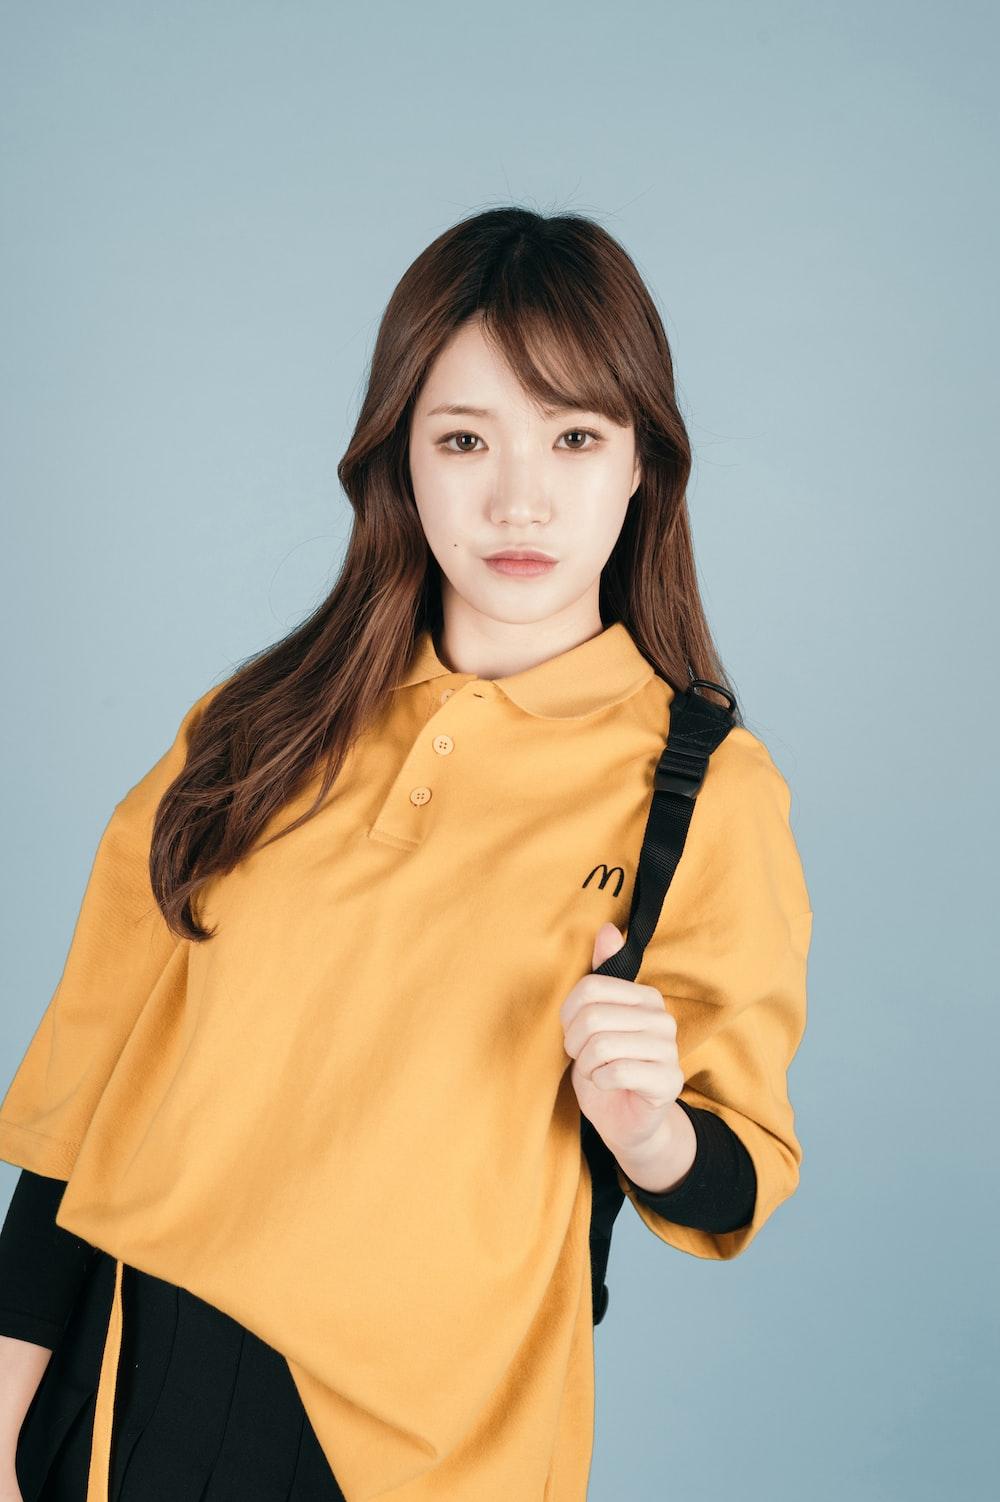 woman in yellow polo shirt taking pose